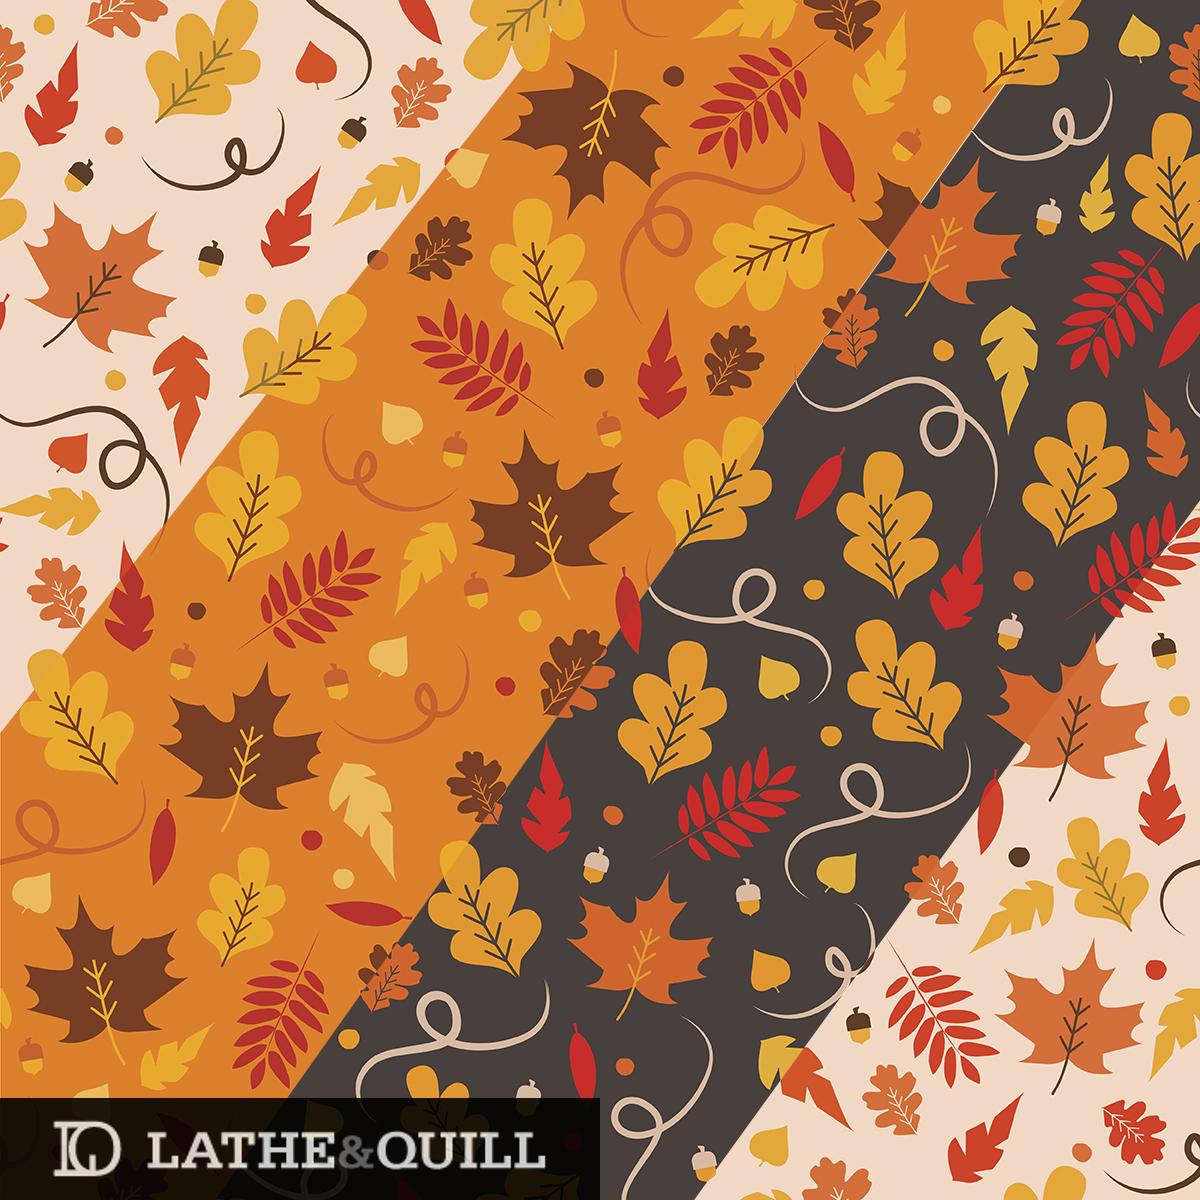 Autumn leaves on maple, oak, locust, and ginkgo